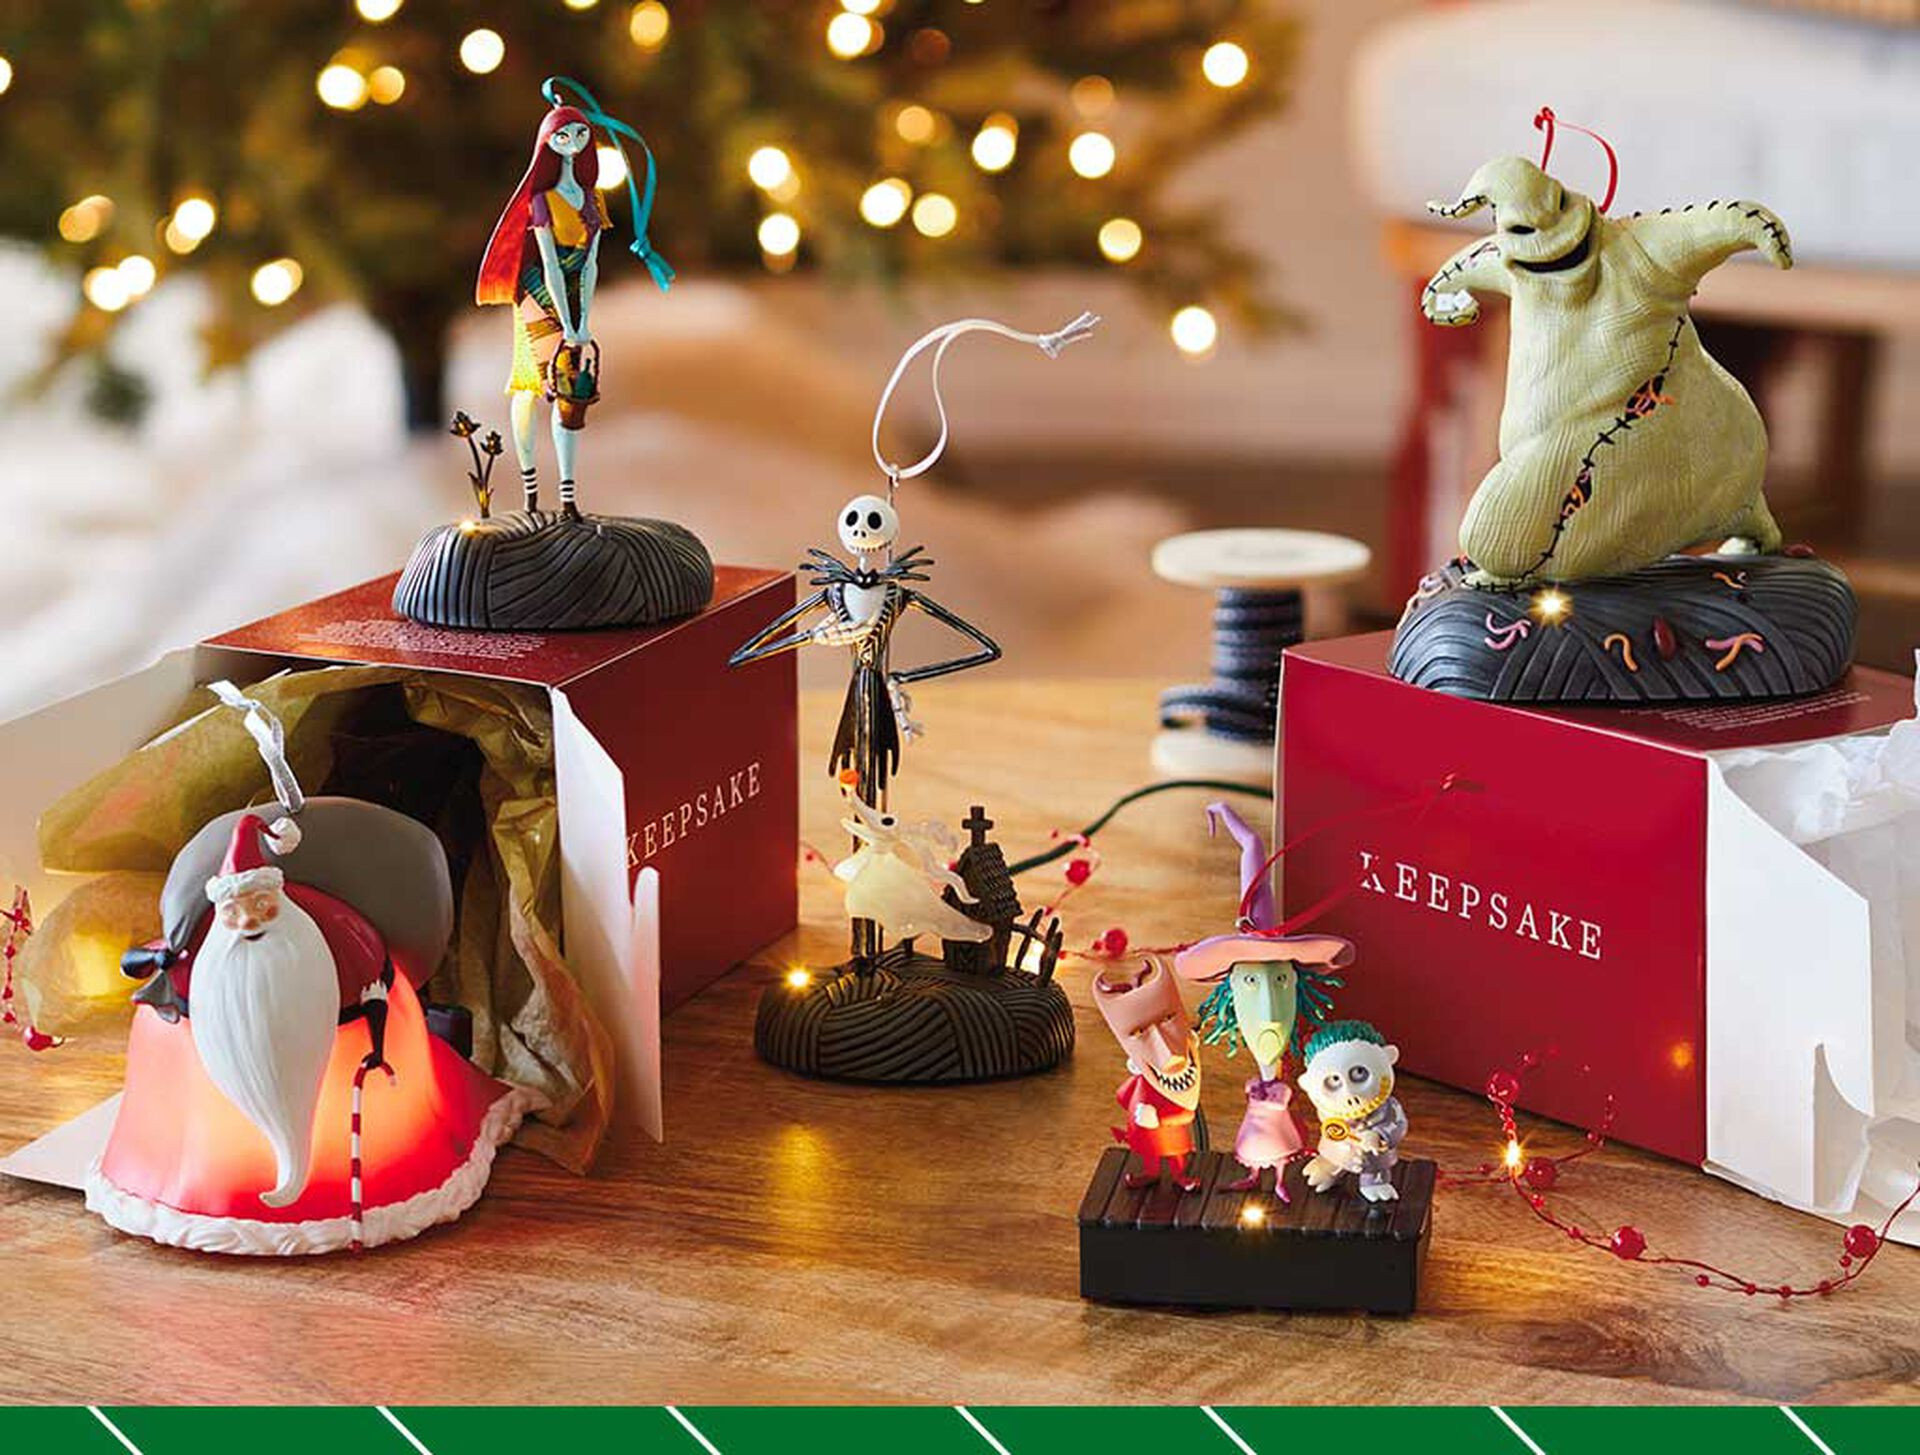 Hallmark Greeting Cards Gifts Ornaments Home Decor Gift Wrap Hallmark